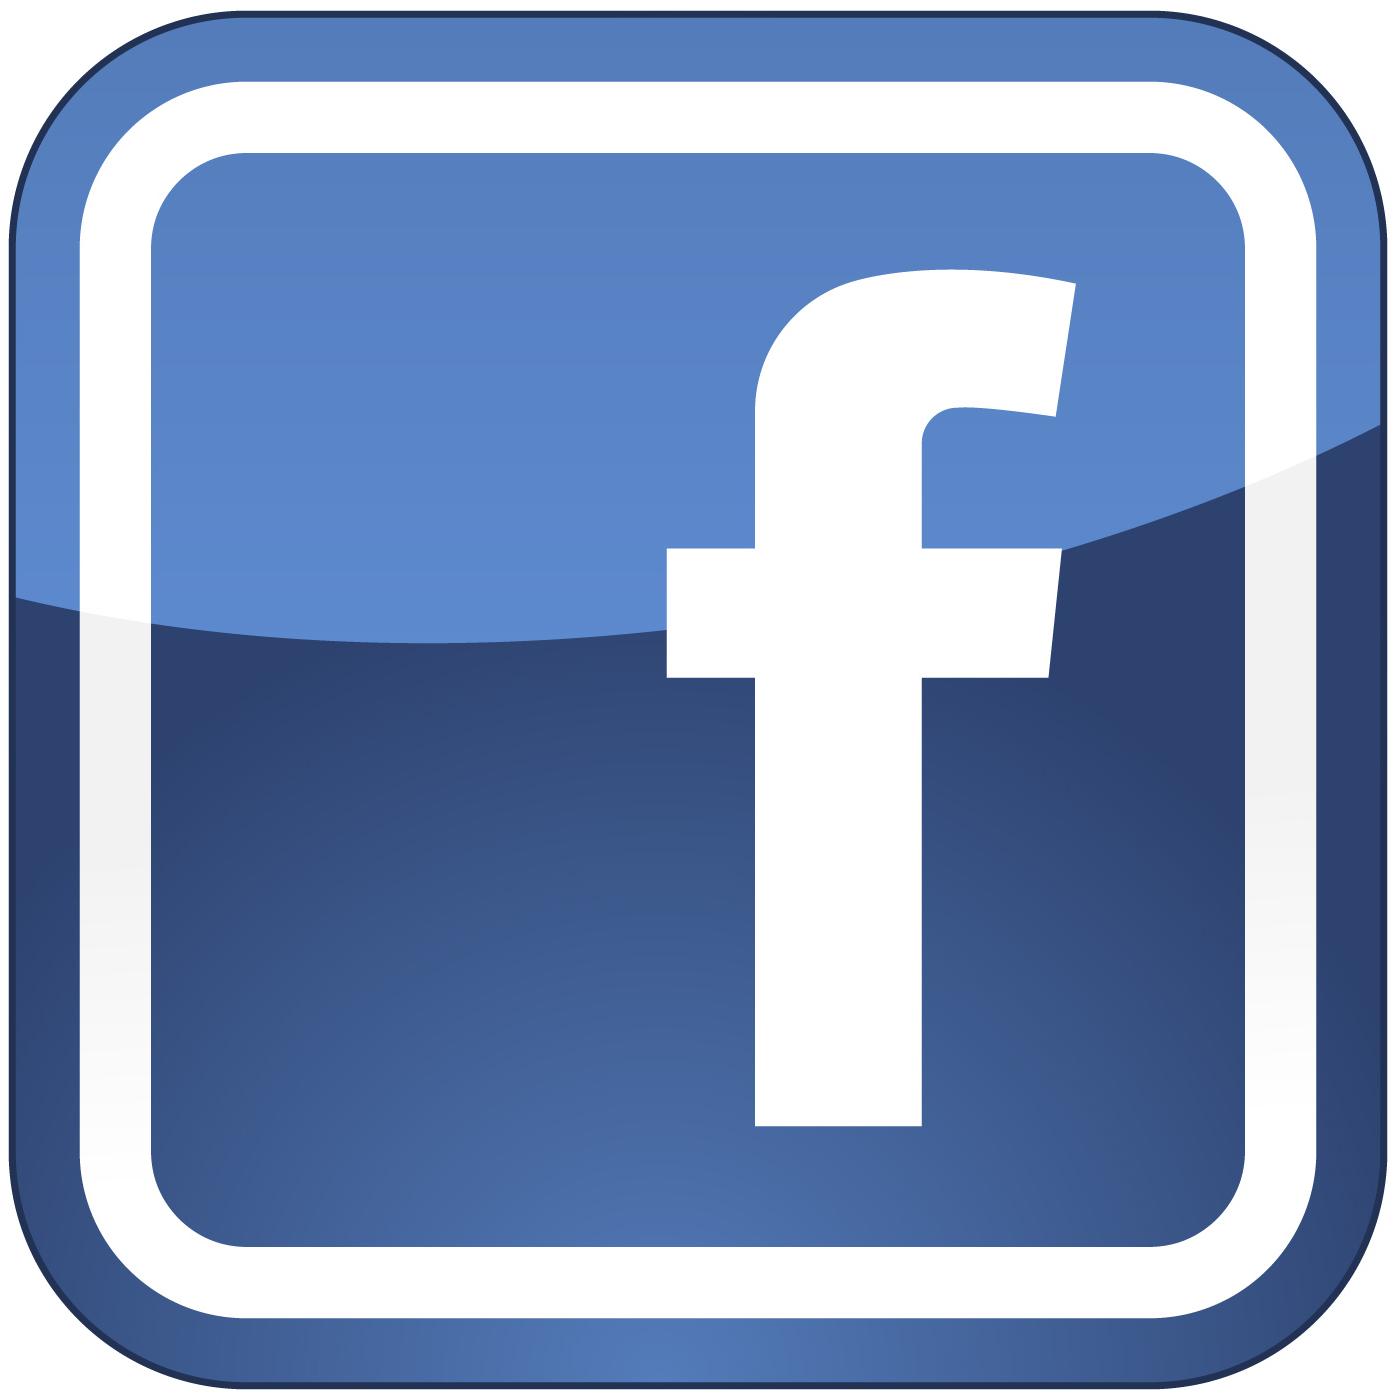 Image result for FB logo